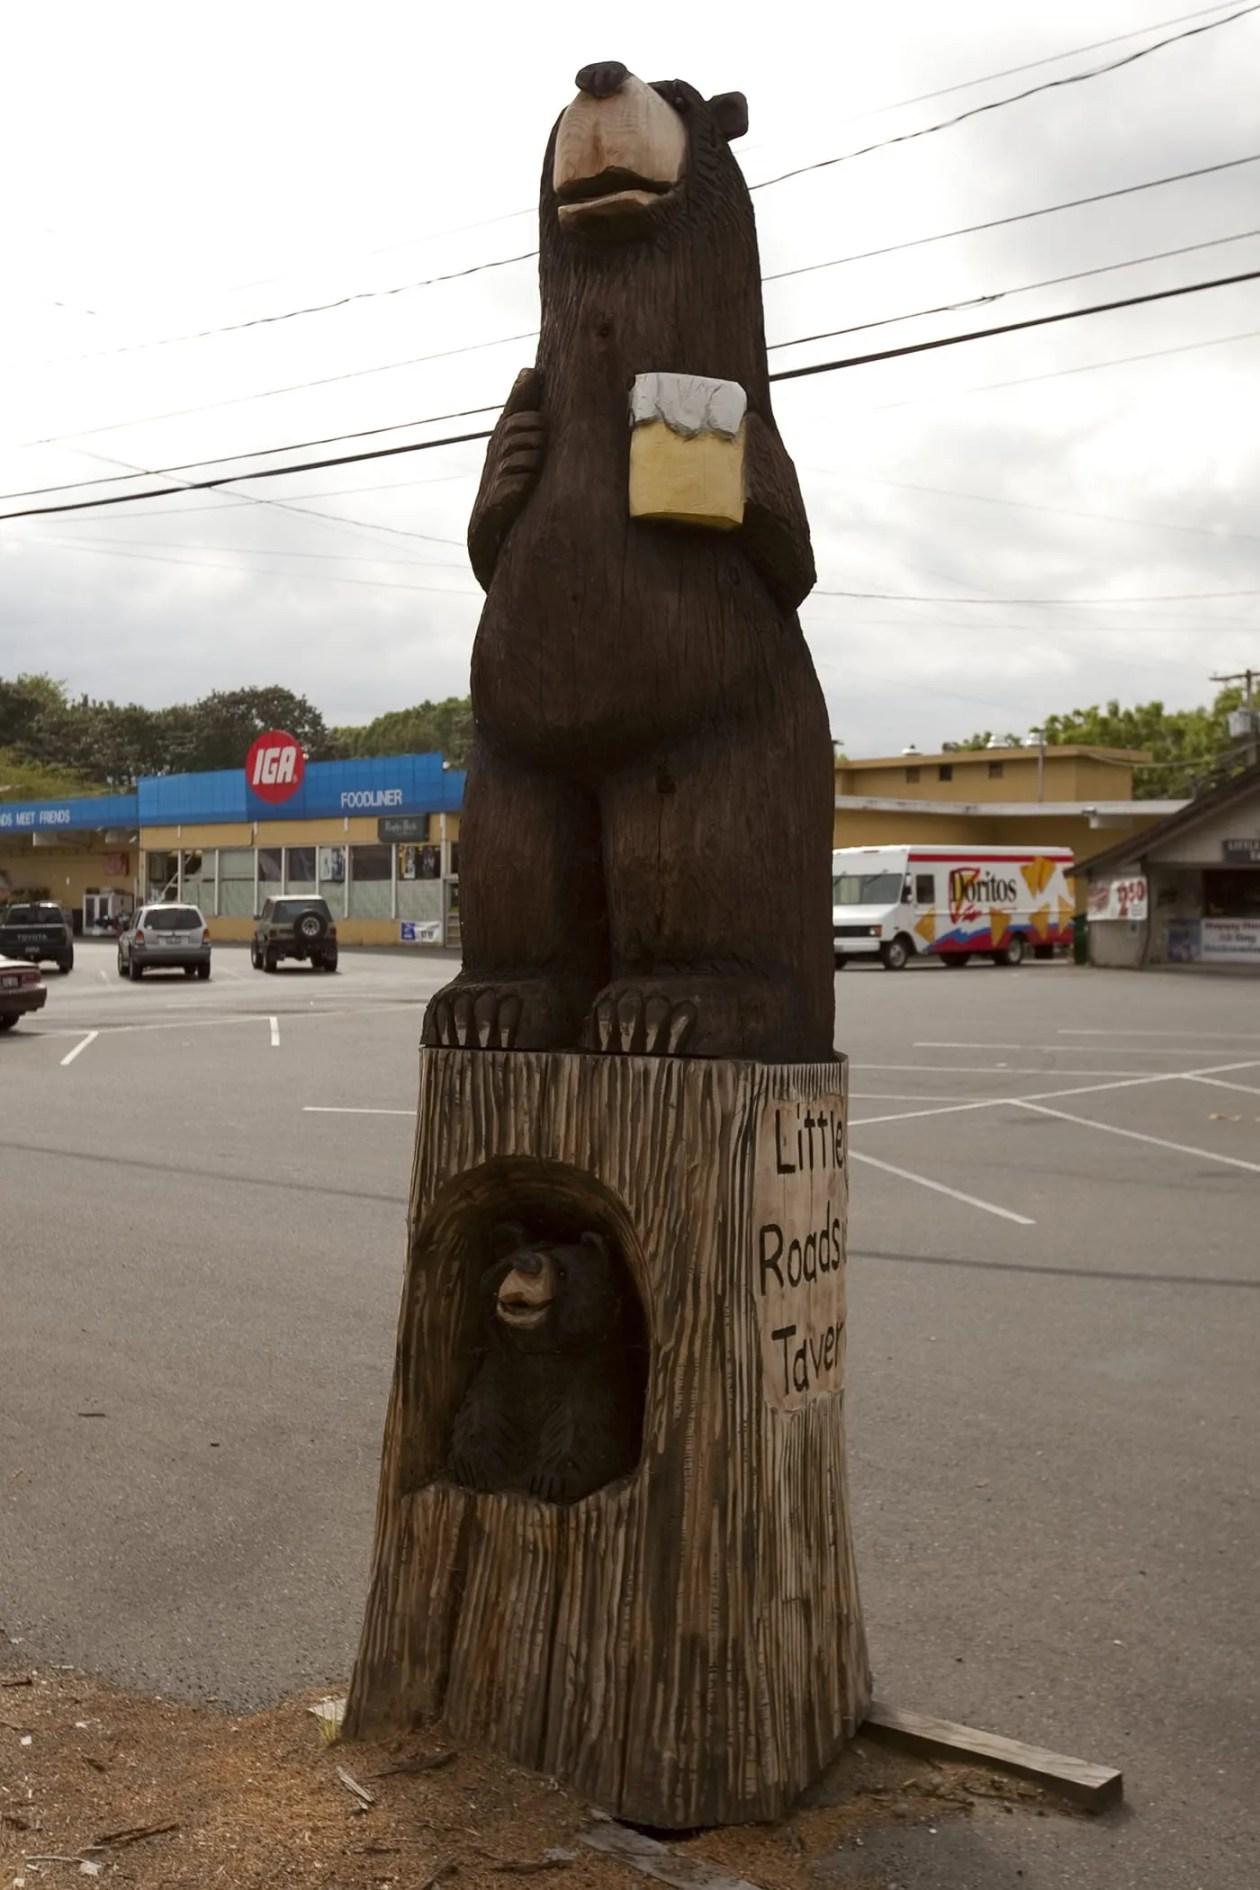 Little Roadside Tavern Bear in Everson, Washington - Carved bear roadside attraction outside of the Little Roadside Tavern in Everson, Washington.